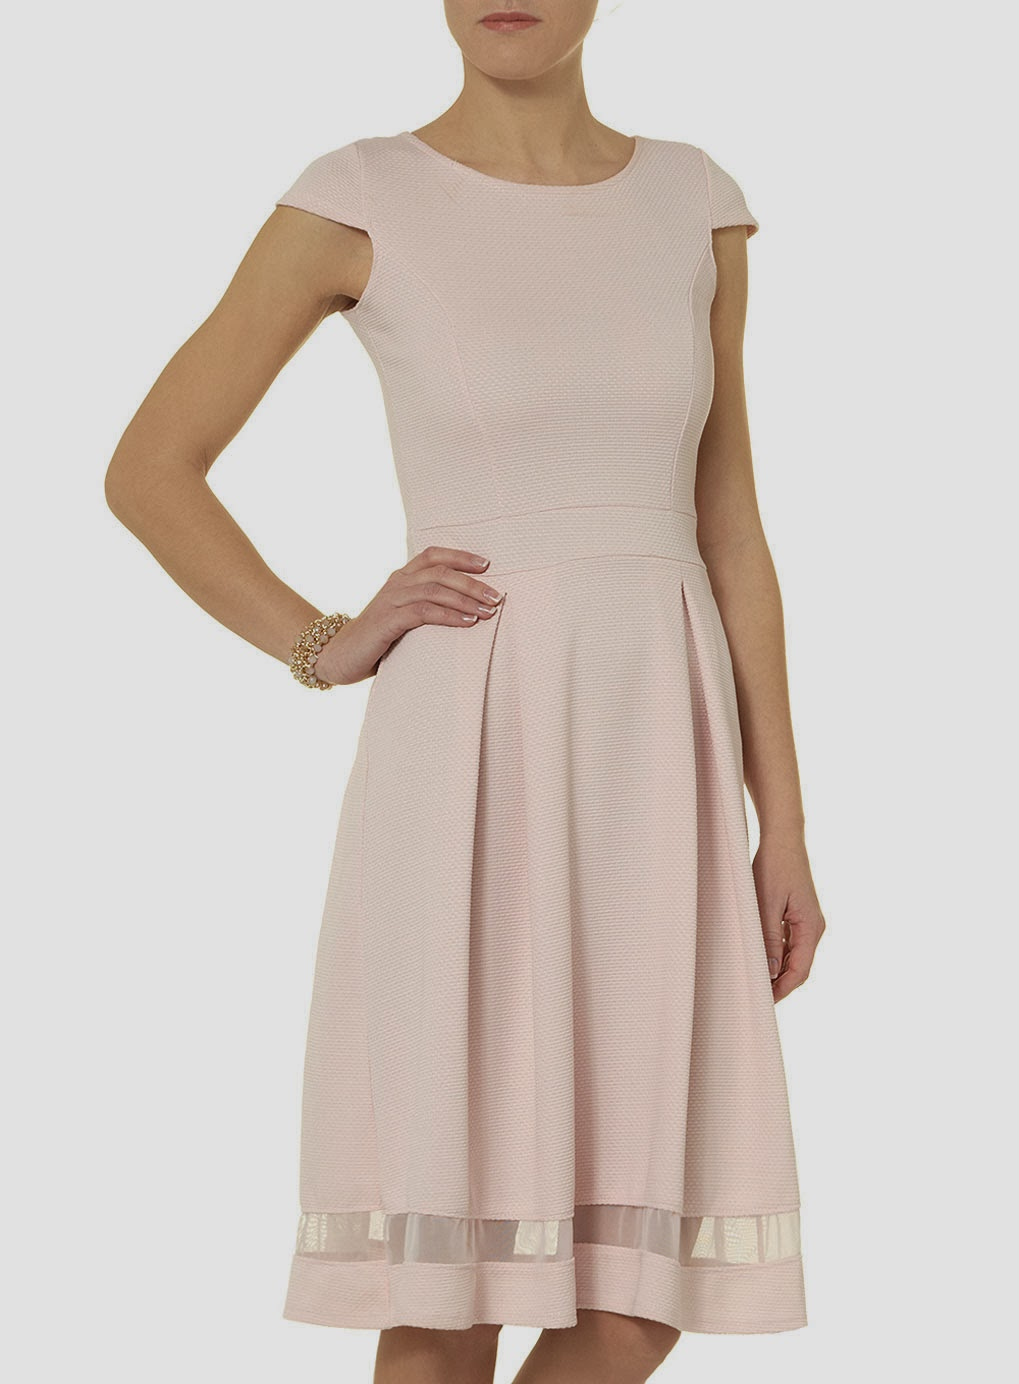 dorothy perkins cream dress